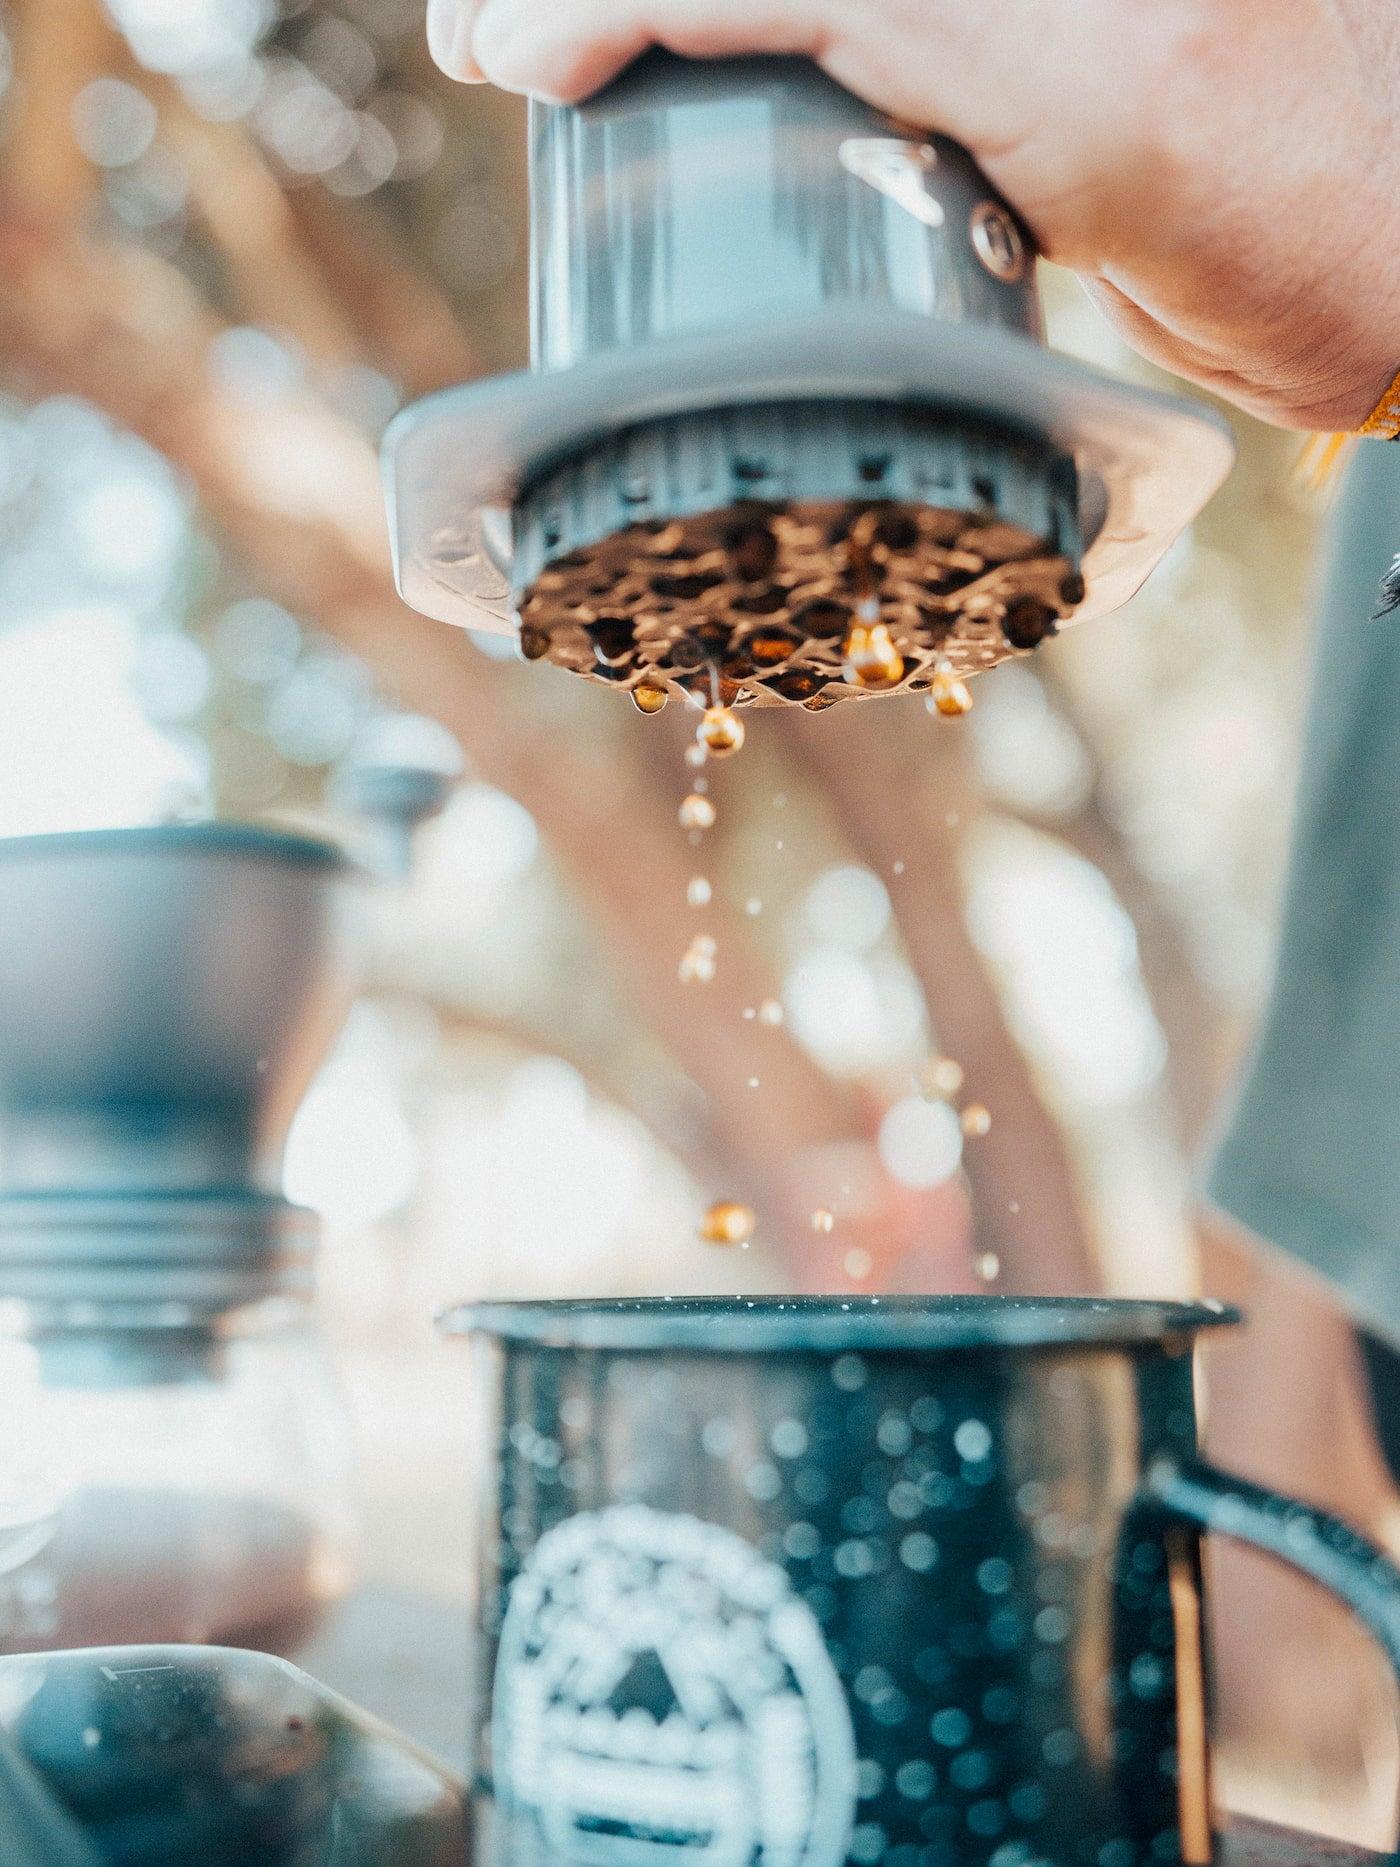 Brewing coffee outside through the aeropress.